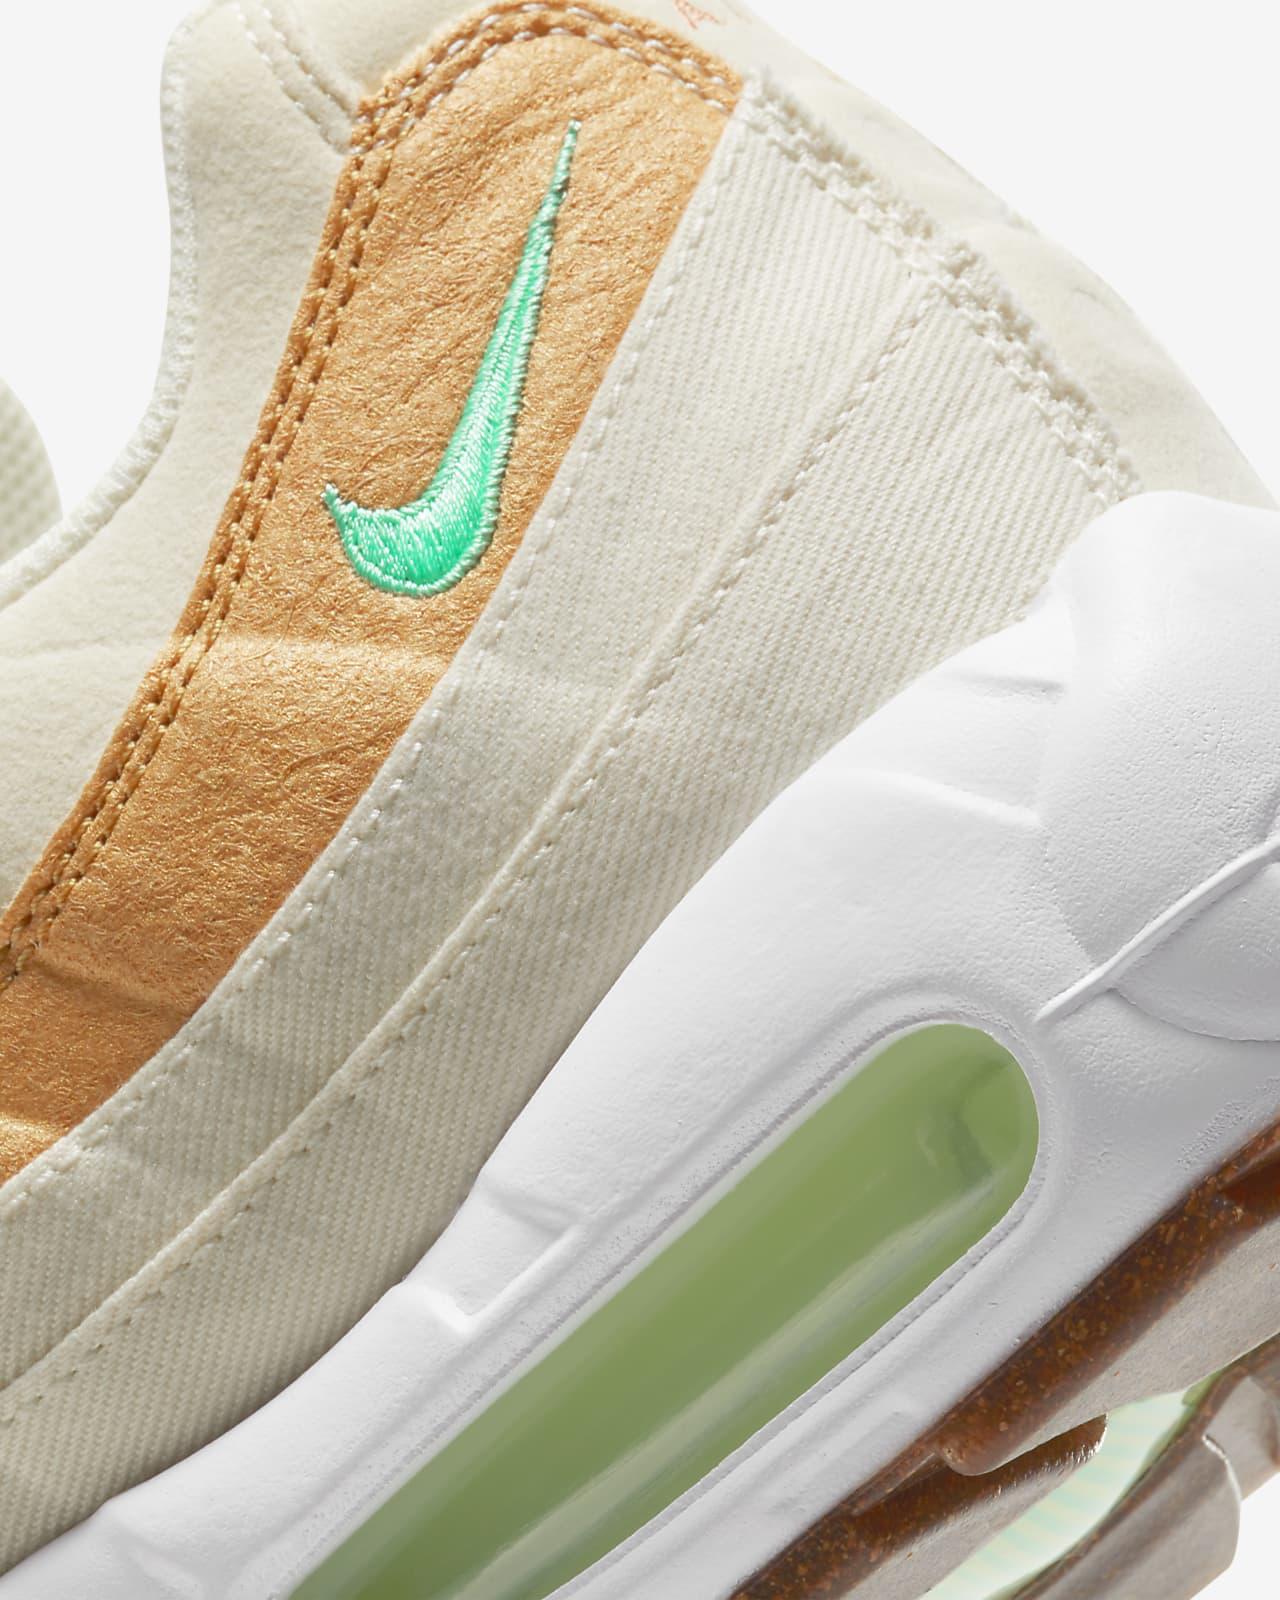 Nike Air Max 95 NRG Men's Shoes